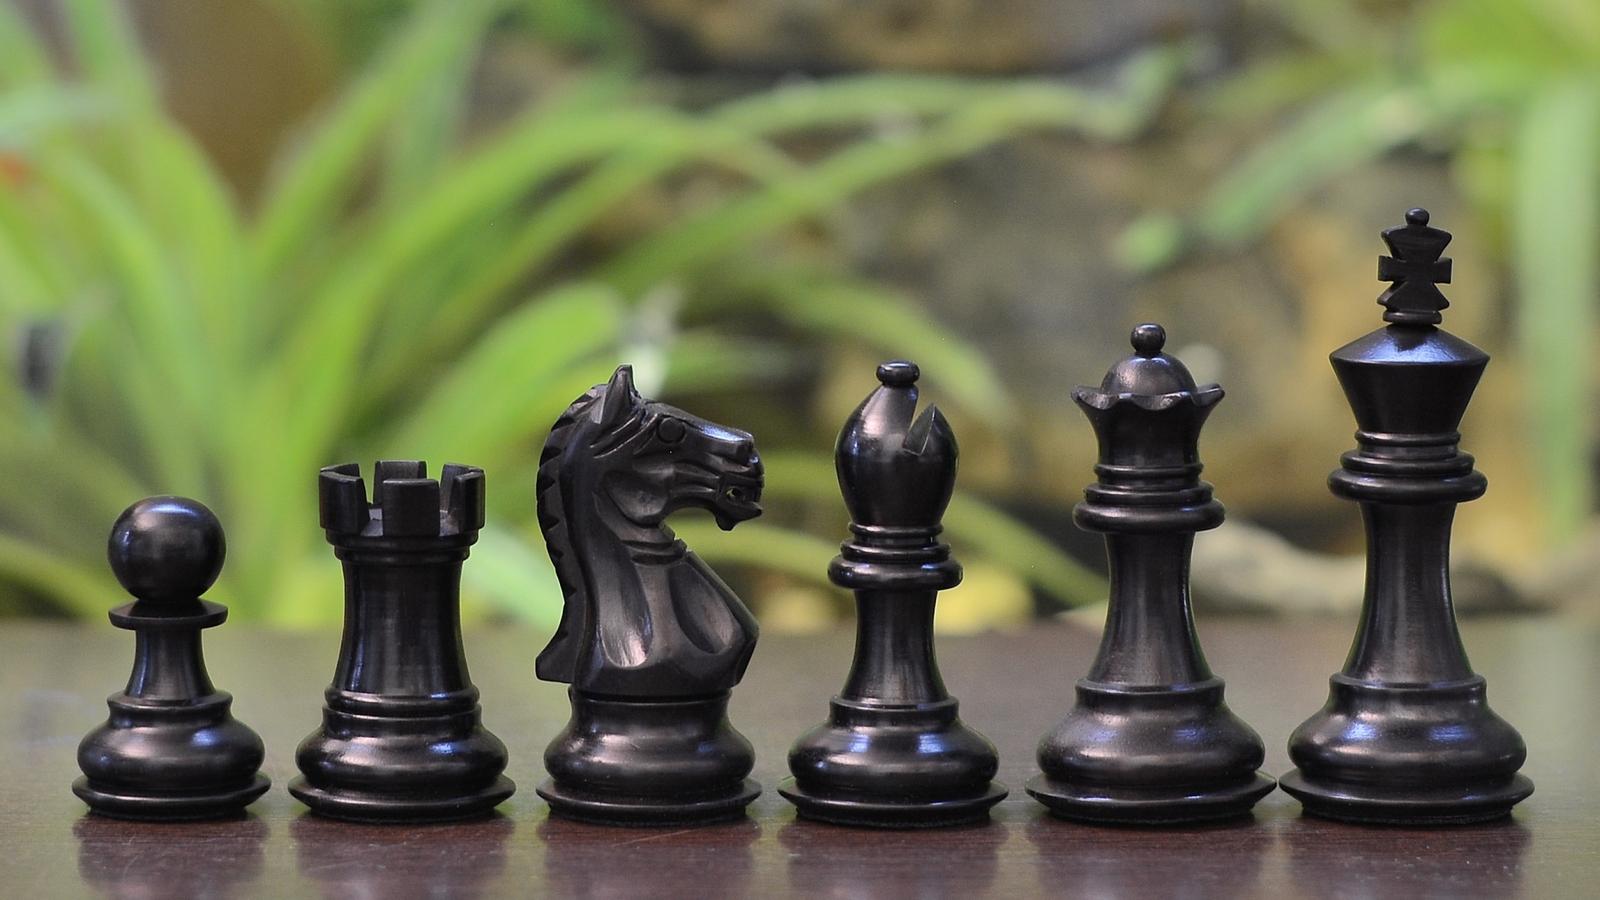 "Fierce Knight Staunton Wooden Chess Pieces In Ebony/Box Wood - 3.0""- SKU:M0009"